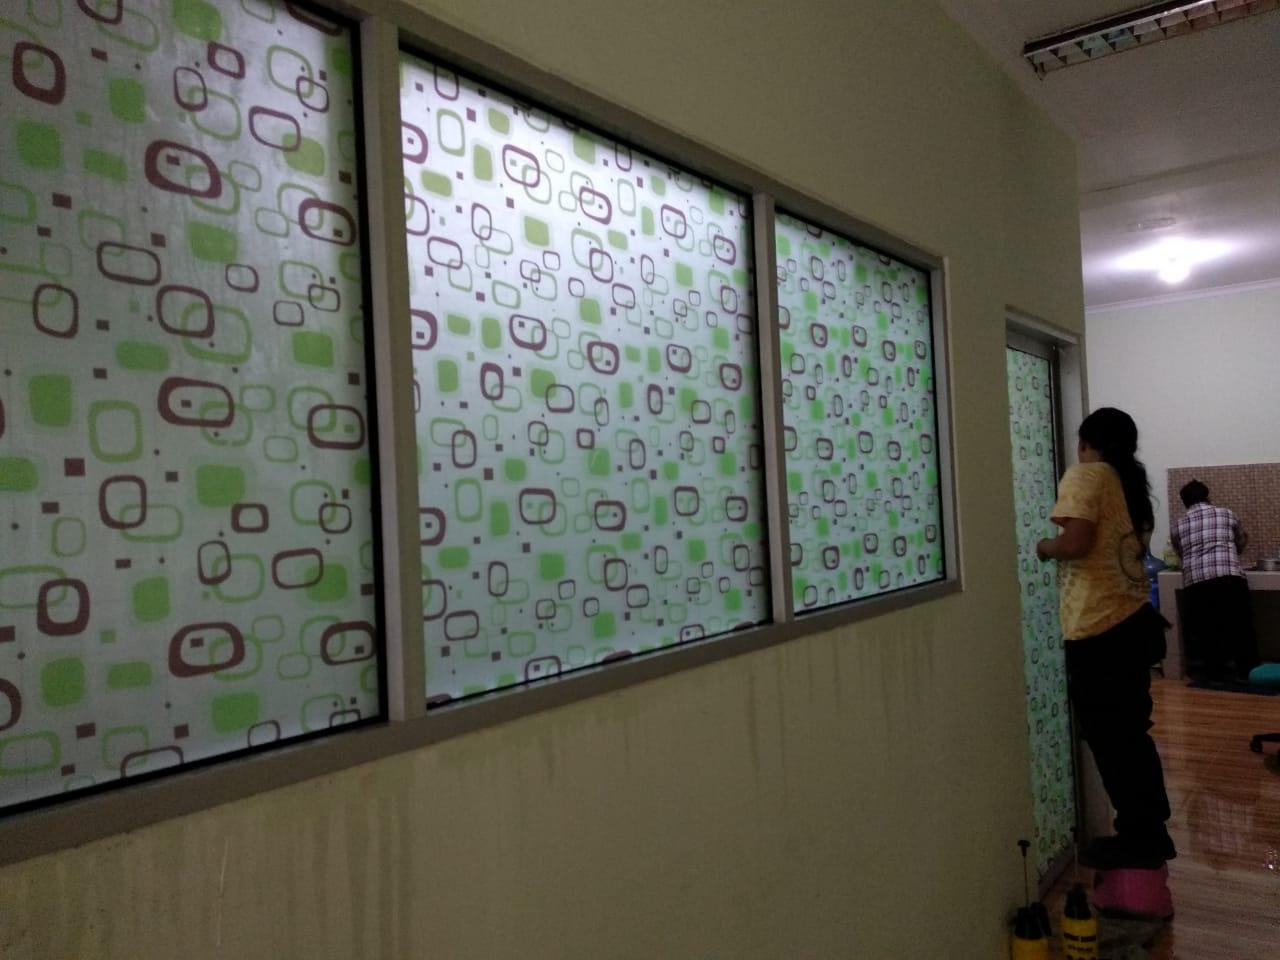 Wallpaper Kantor Wallpaper Kaca Film Sticker Motif